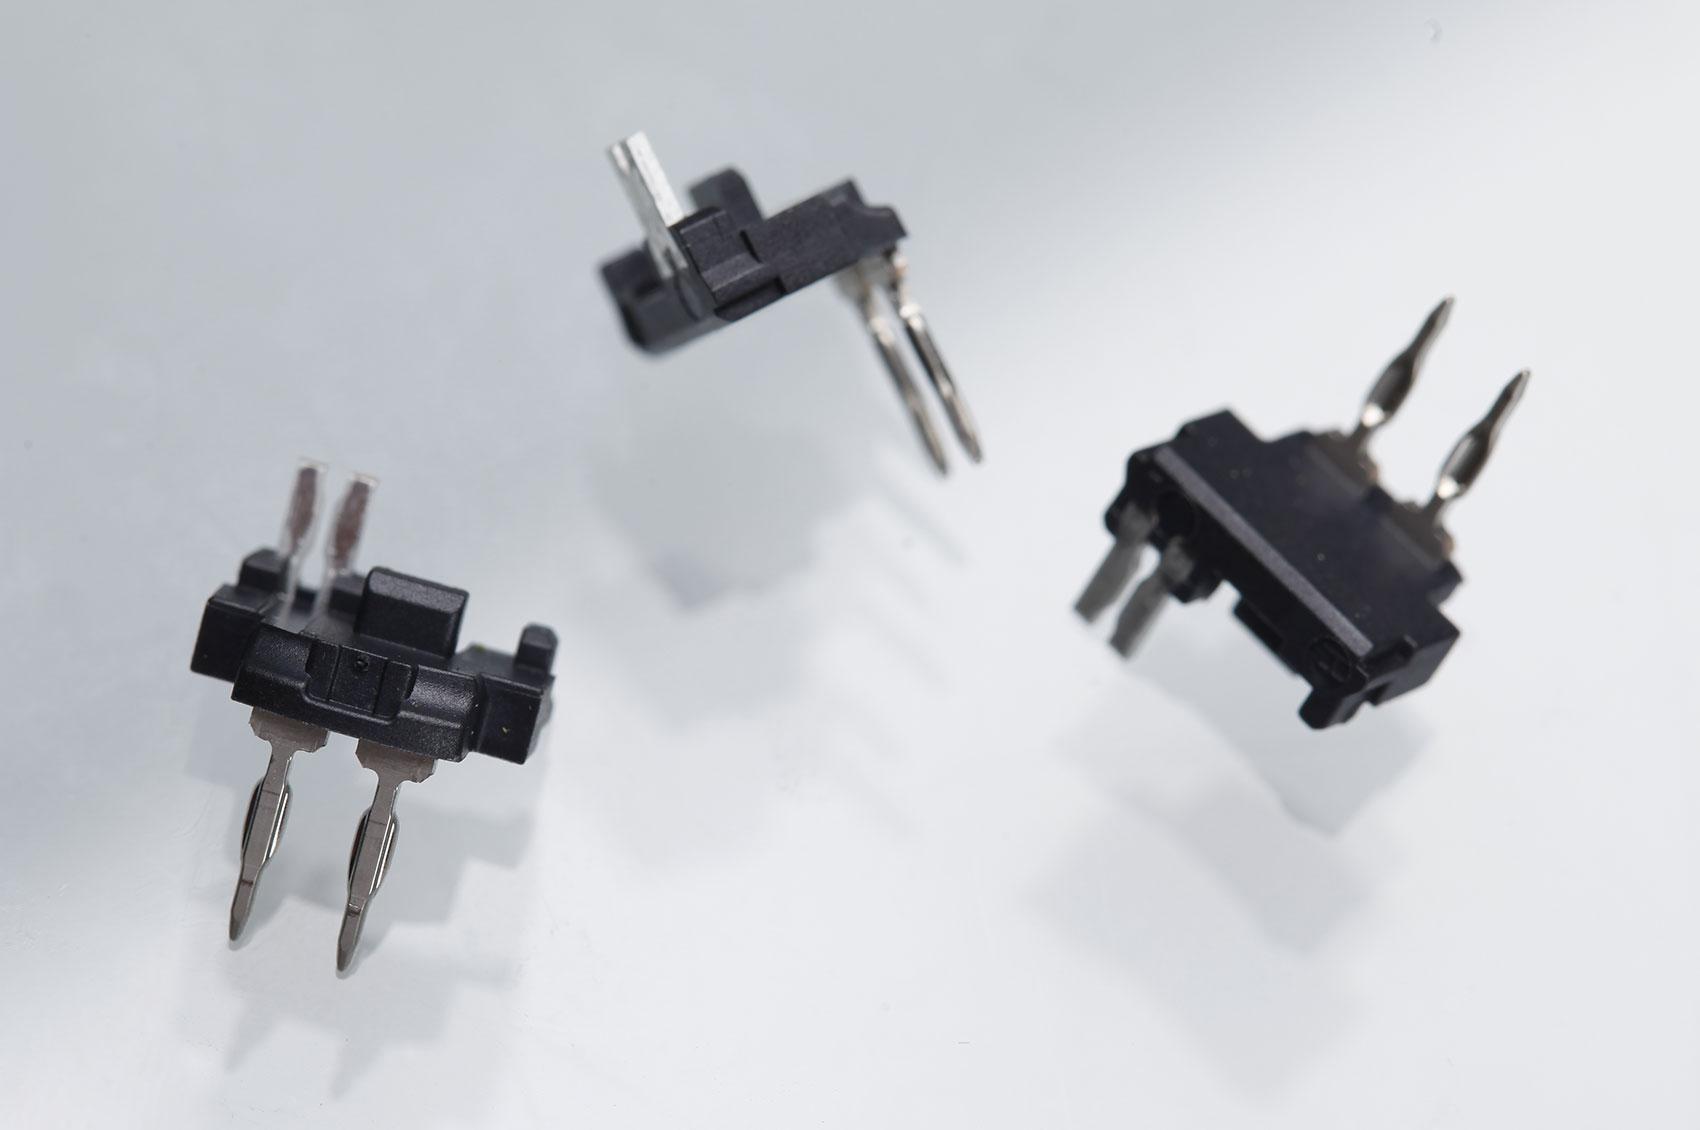 Products Adduxi Park Assist Circuit Contact Carrier Sensor